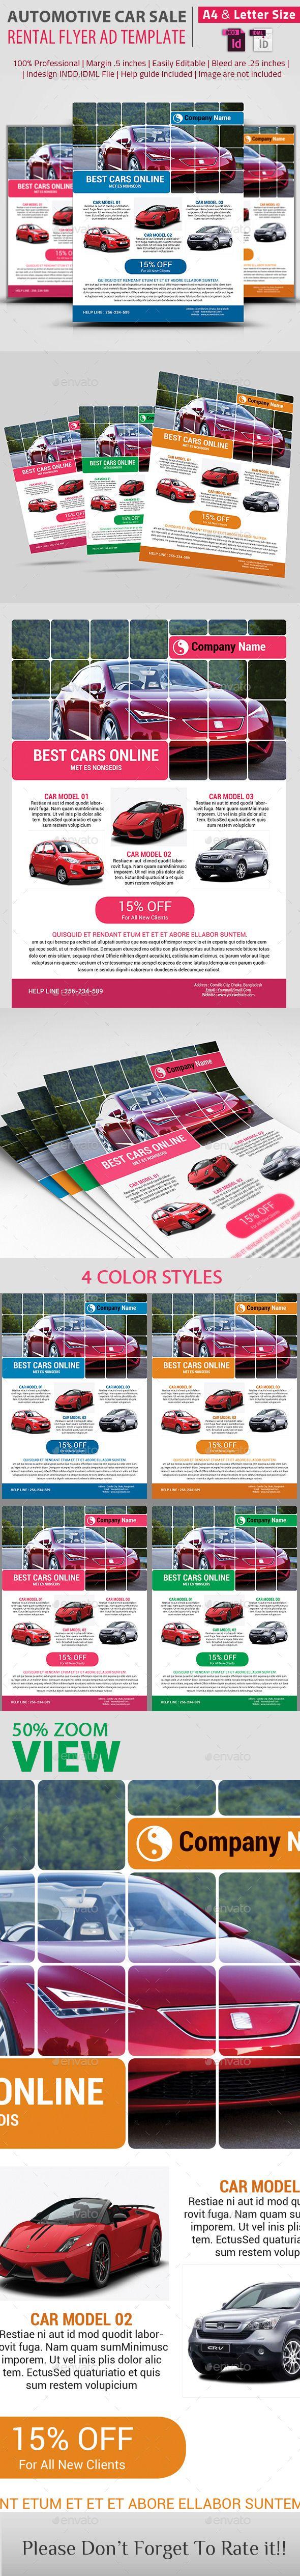 Automotive Car Sale Rental Flyer Ad Template  Indesign Indd